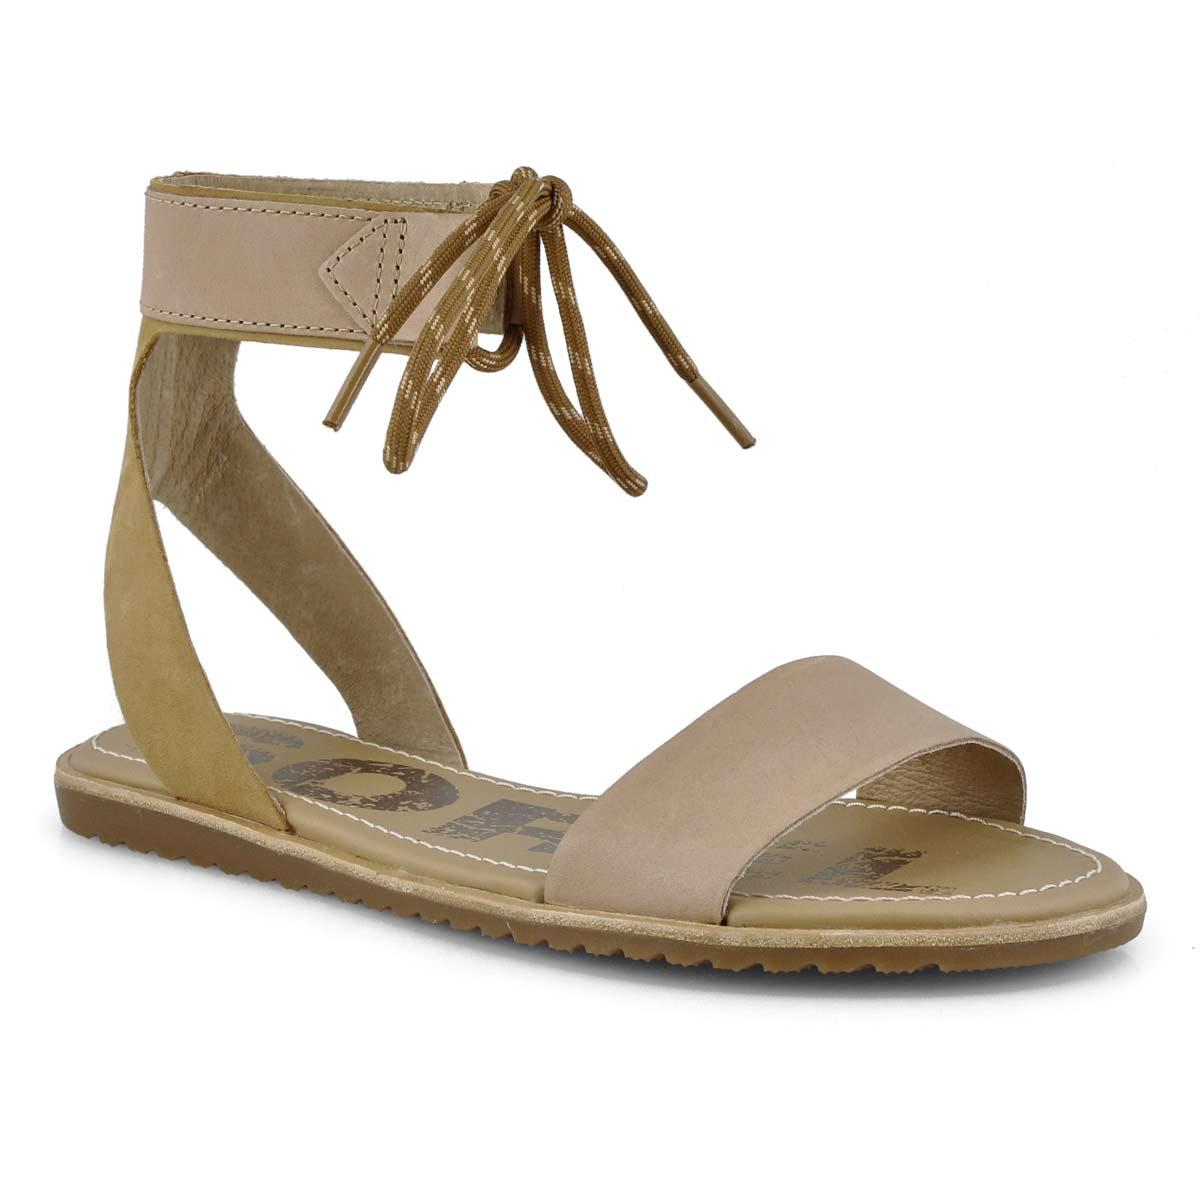 Sandale, Ella Ankle, beige, femmes